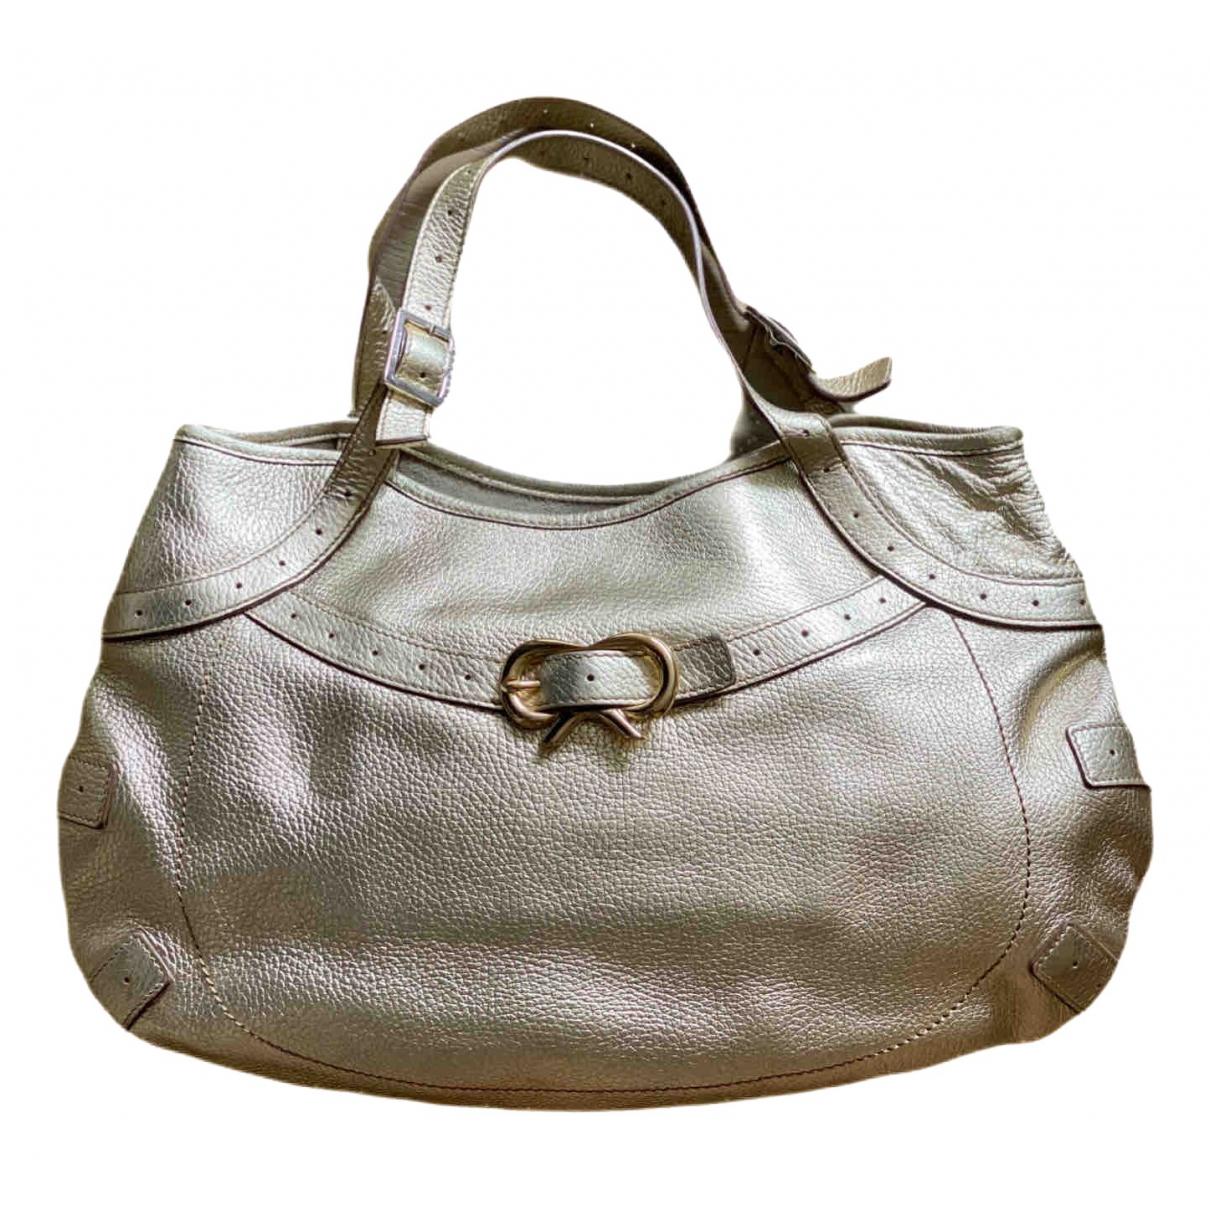 Anya Hindmarch N Gold Leather handbag for Women N